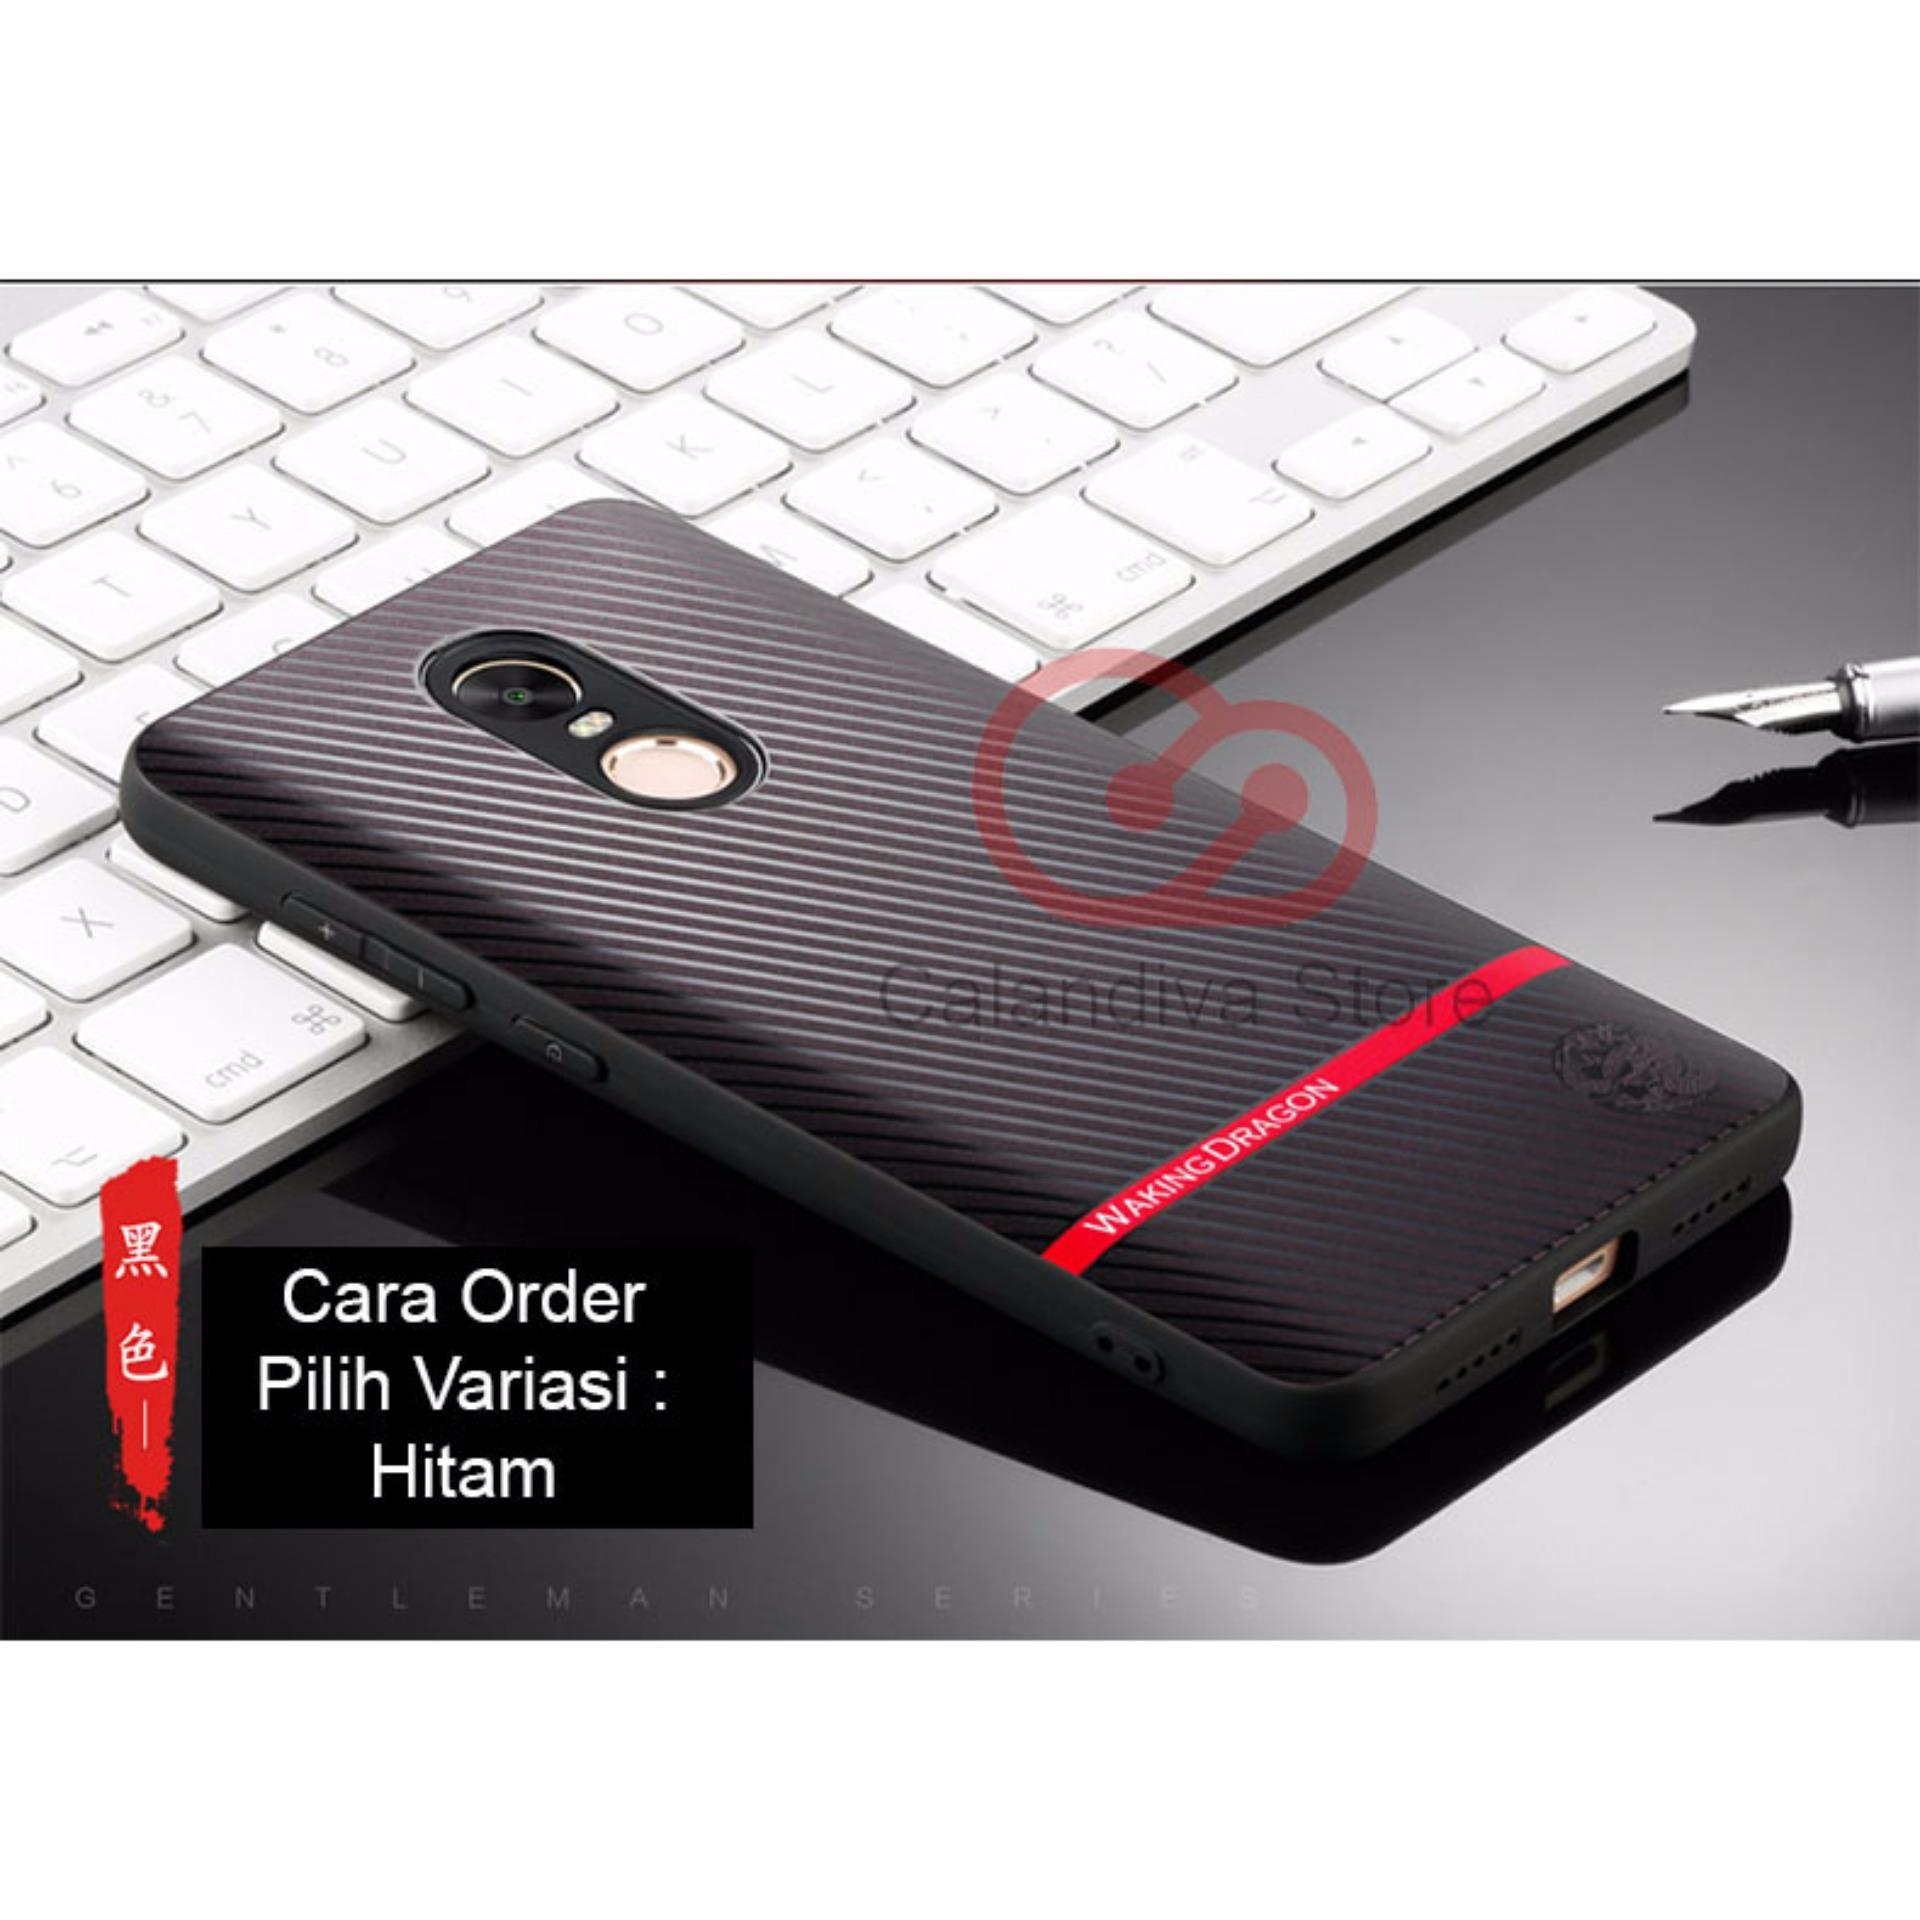 Peonia Premium Carbon Shockproof Hybrid Case For Xiaomi Redmi Note Transparent Acrylic 4x Snapdragon Tg Merah Calandiva Gentleman Series 4 Mediatek